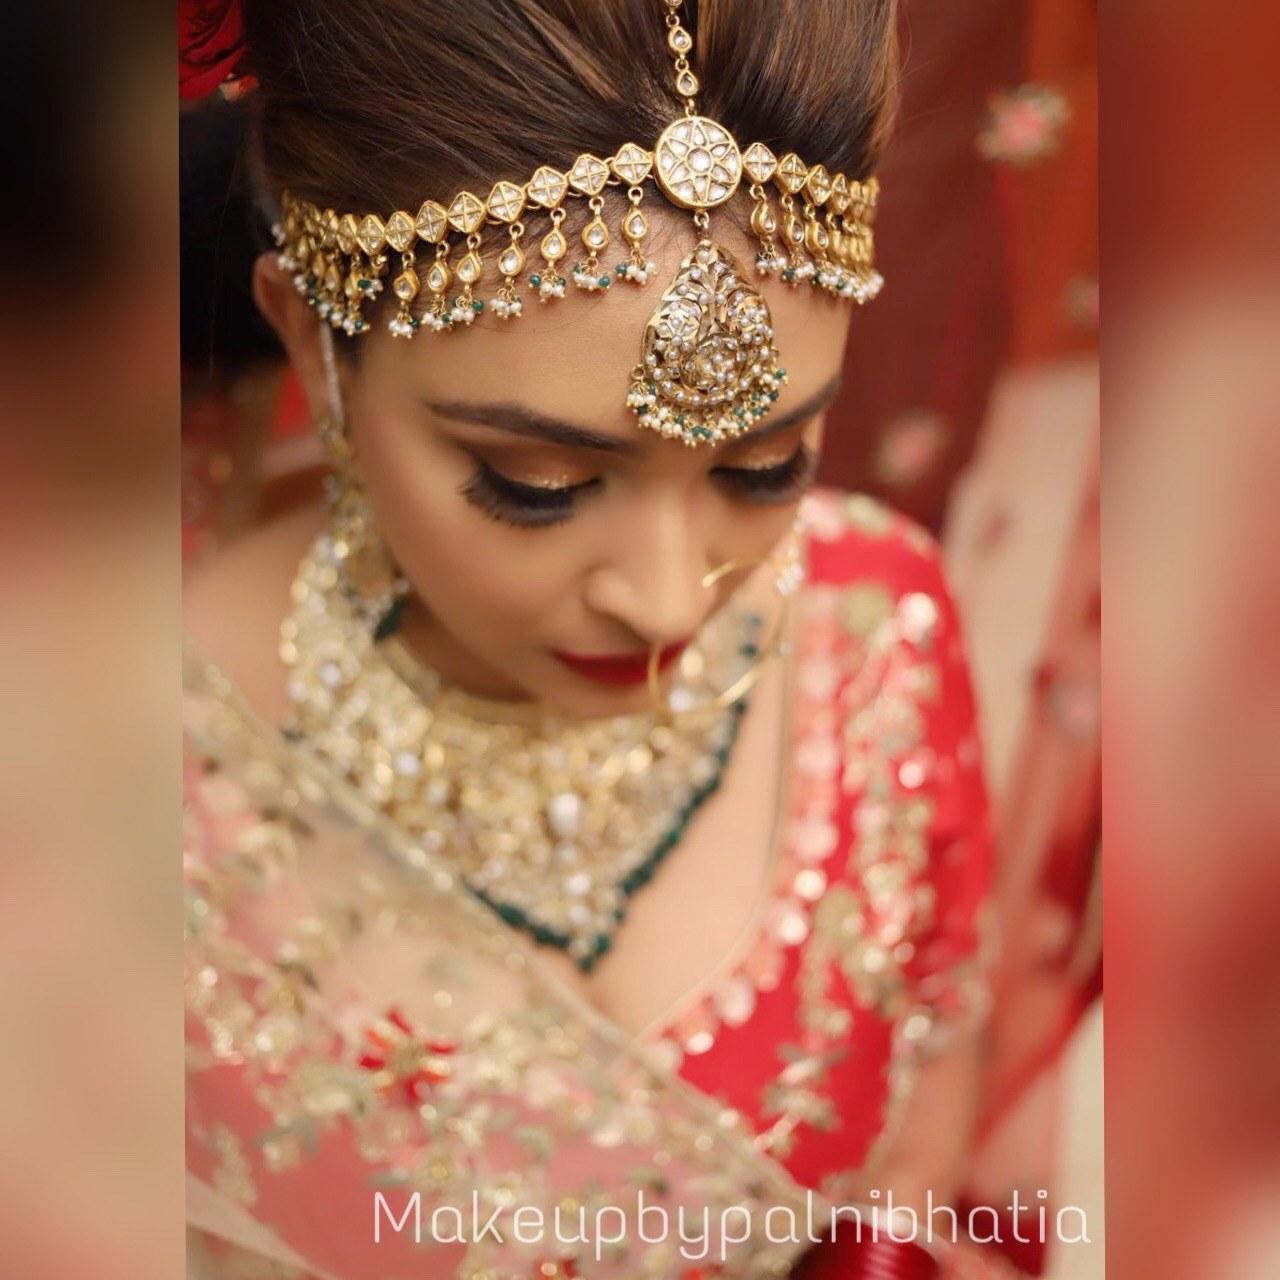 Portfolio - Makeupbypalnibhatia